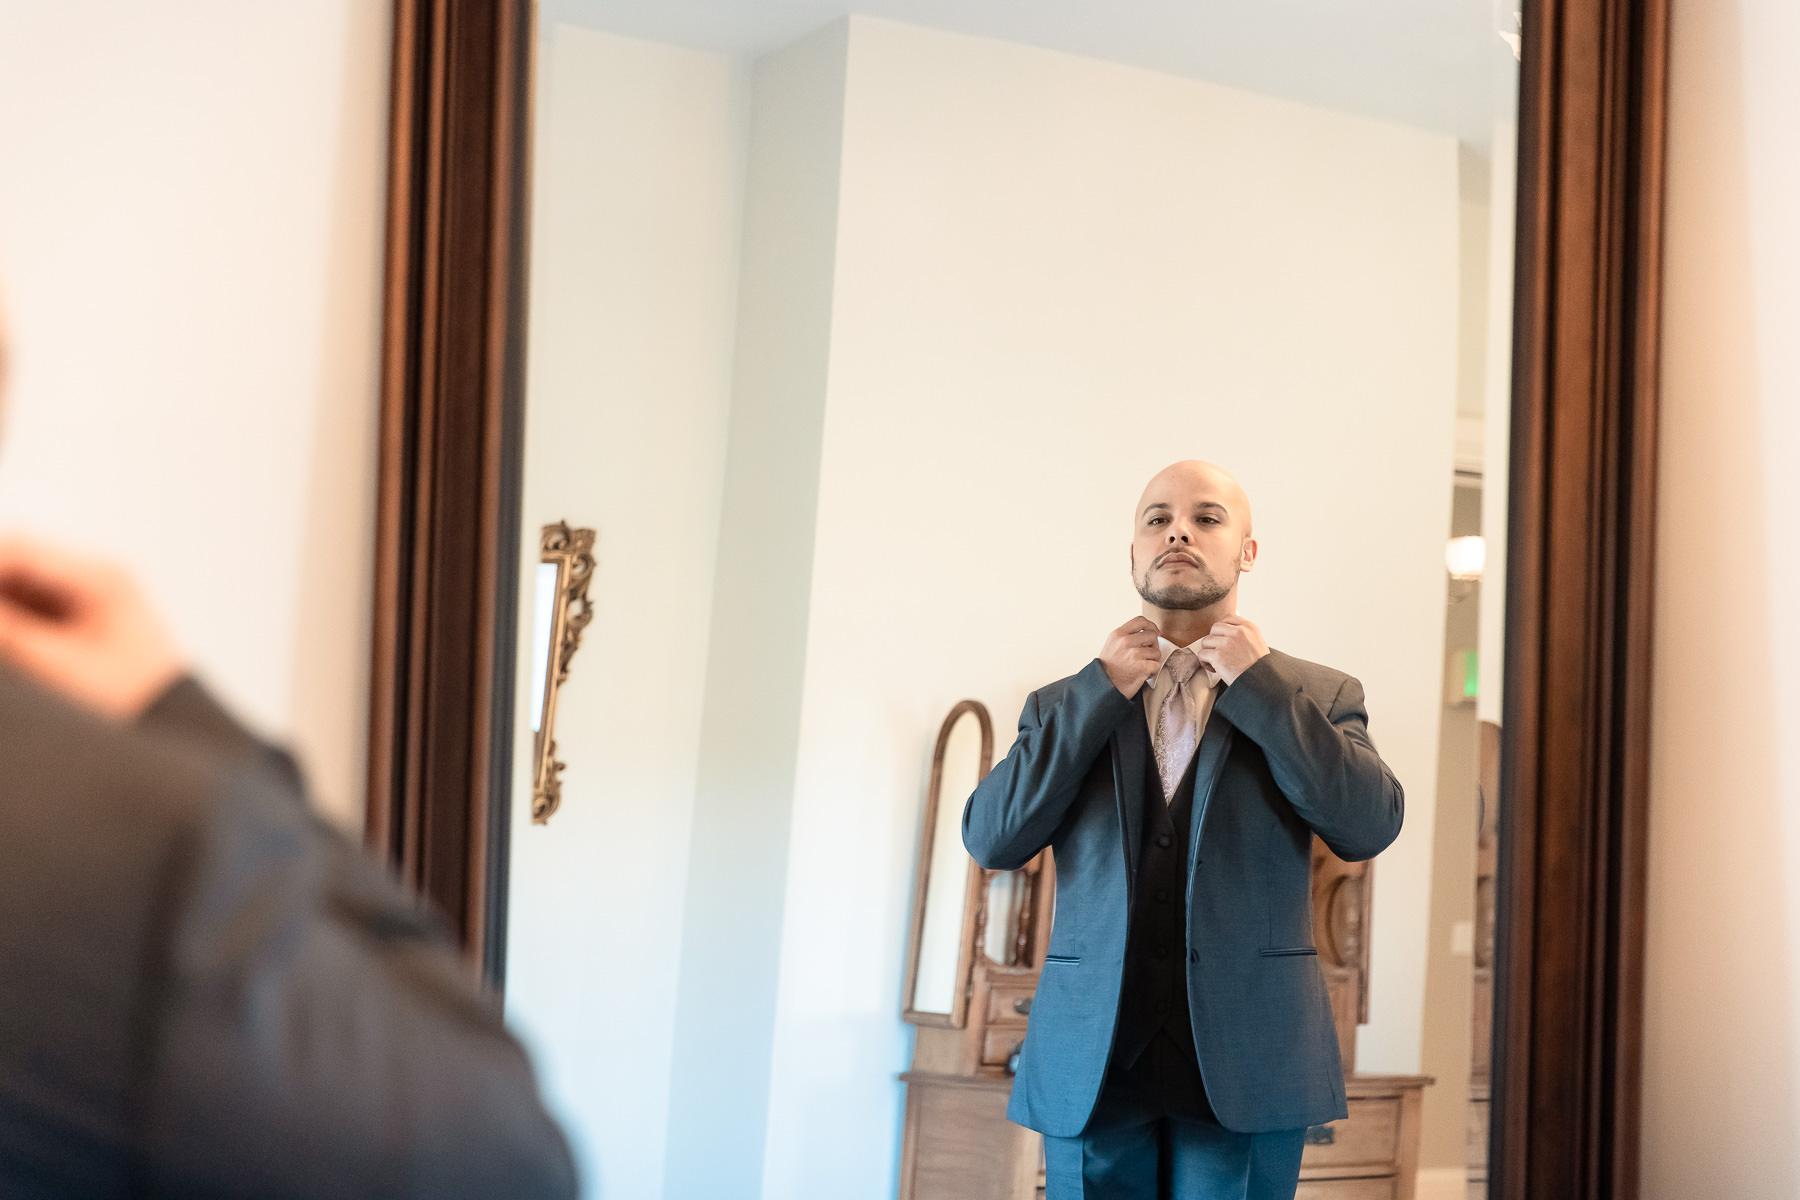 Eisenhower House, Newport, Rhode Island, Tracy Jenkins Photography, wedding, LGBTQ+, LGBT, Gay, Inclusive, Photography, Wedding photography, getting ready, tux, tie